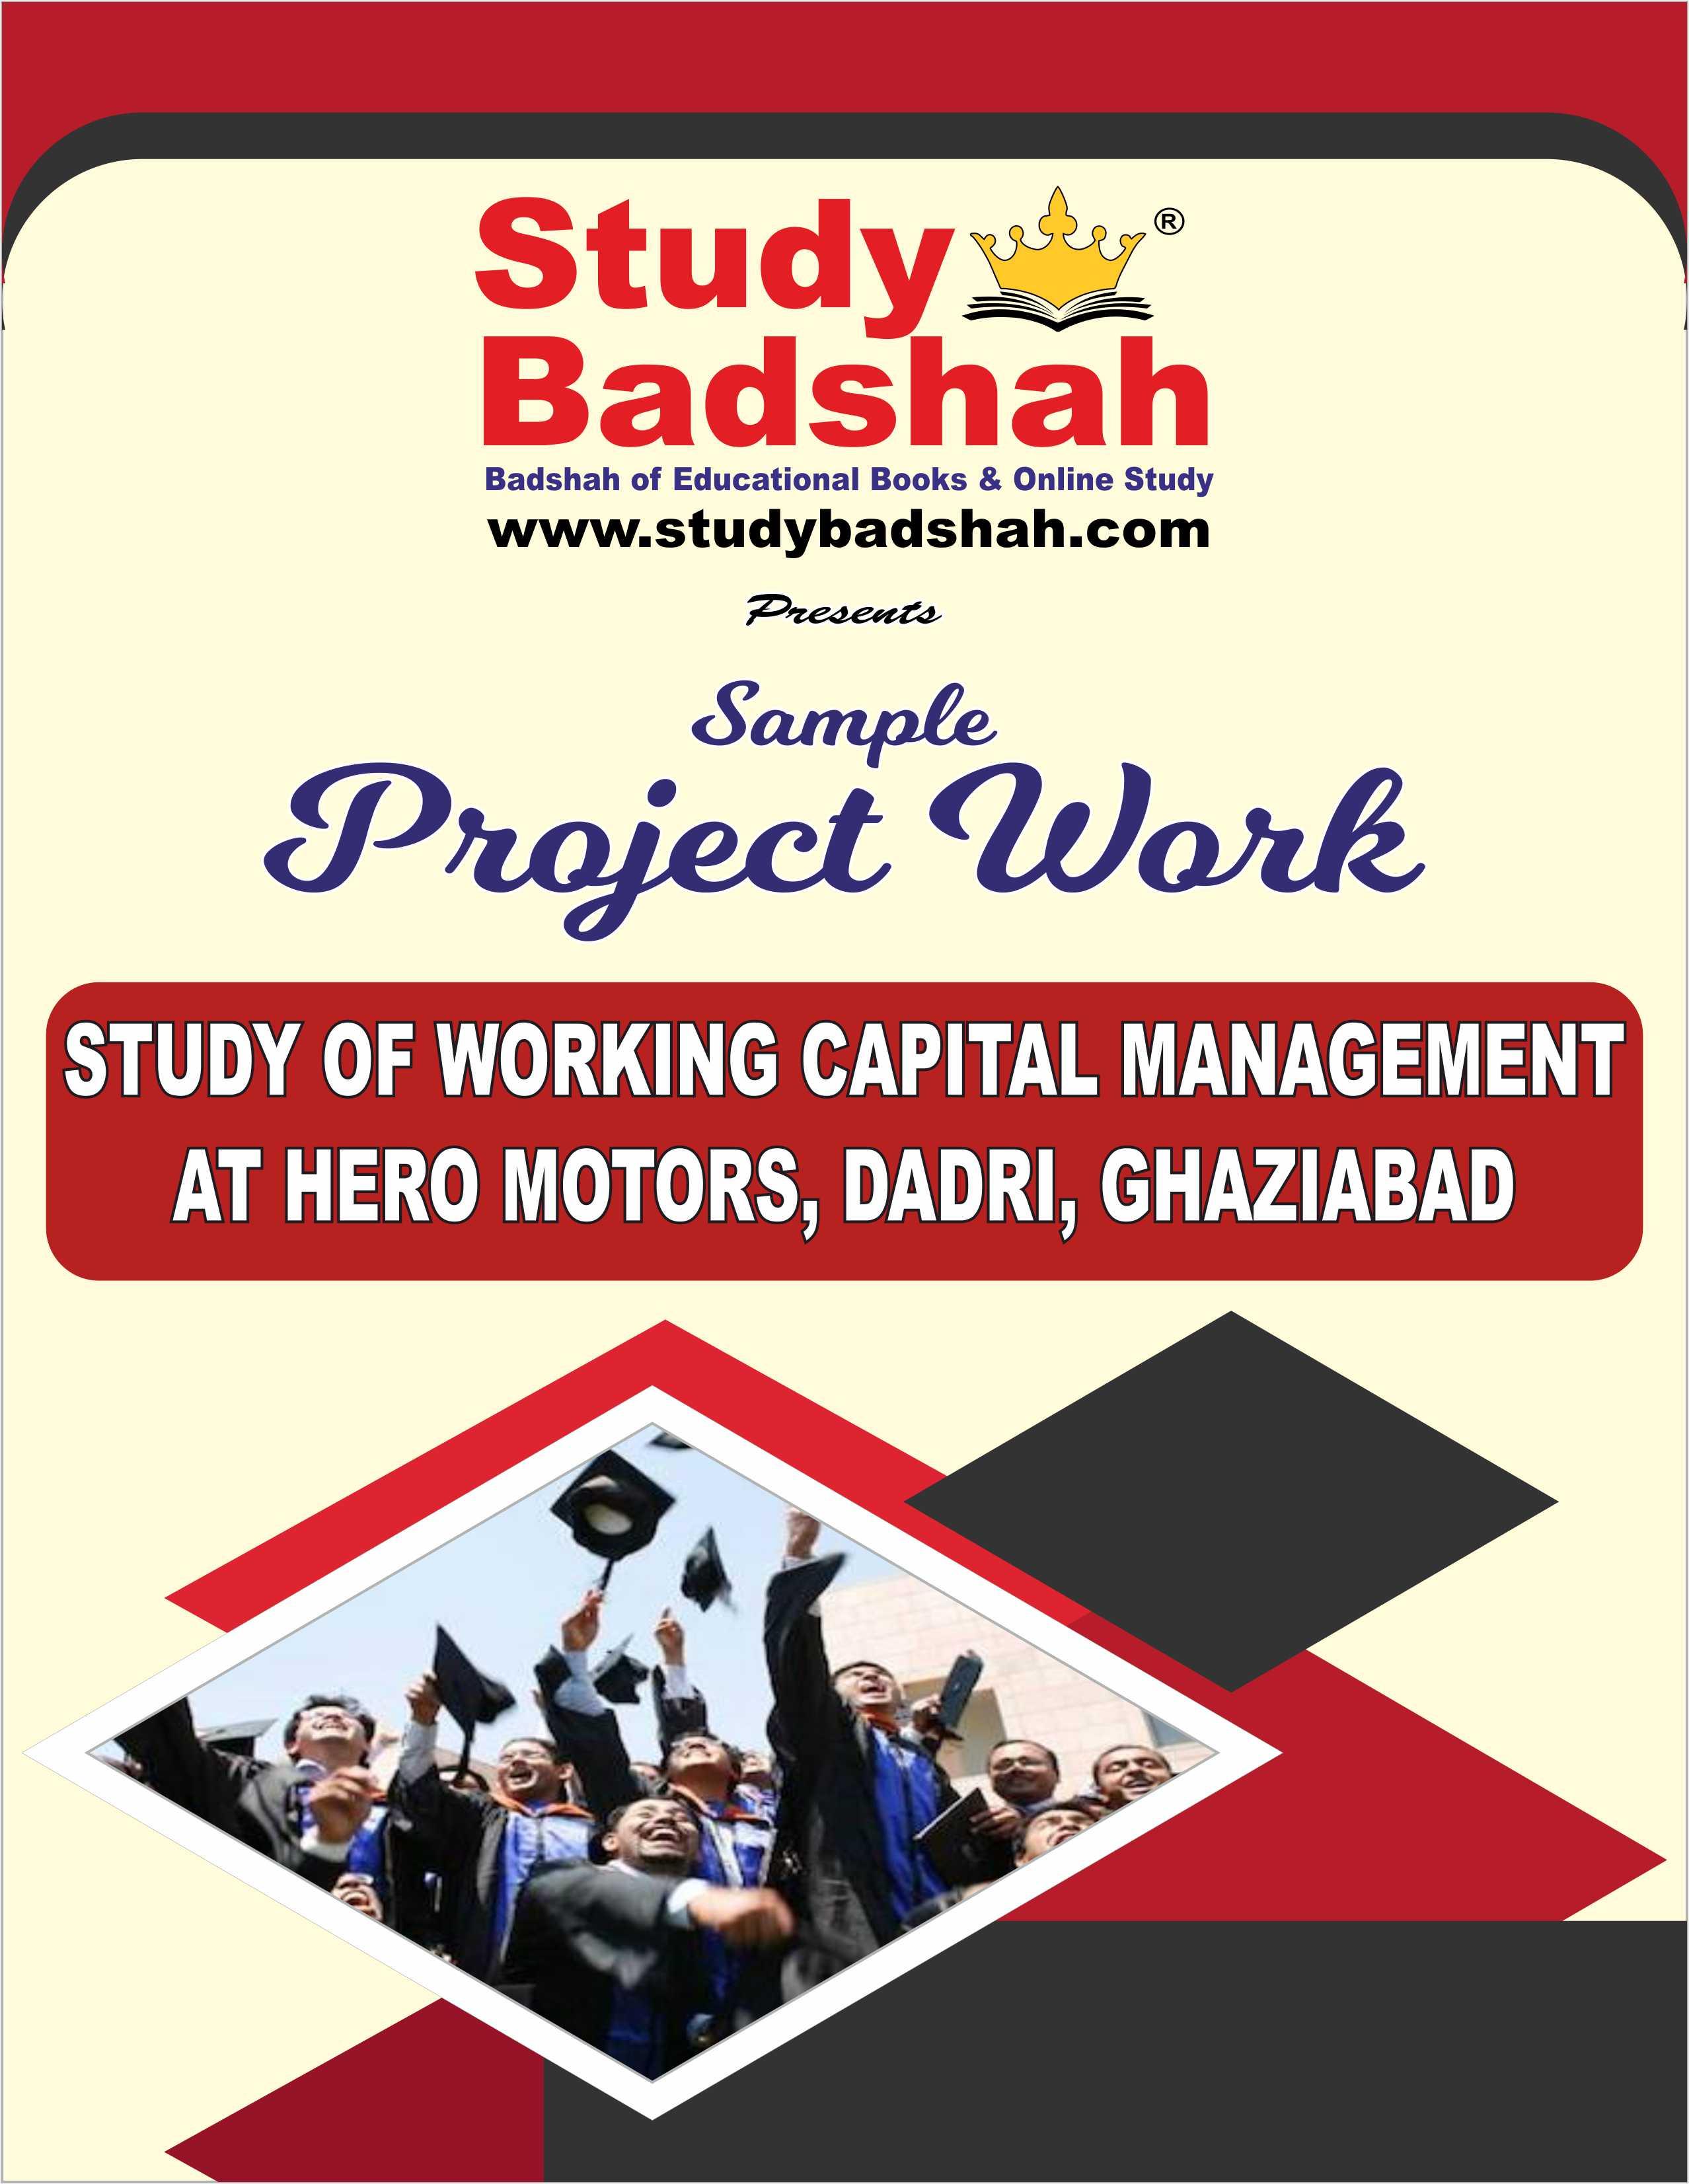 Study of Working capital Management at Hero Motors Dadri ghaziabad